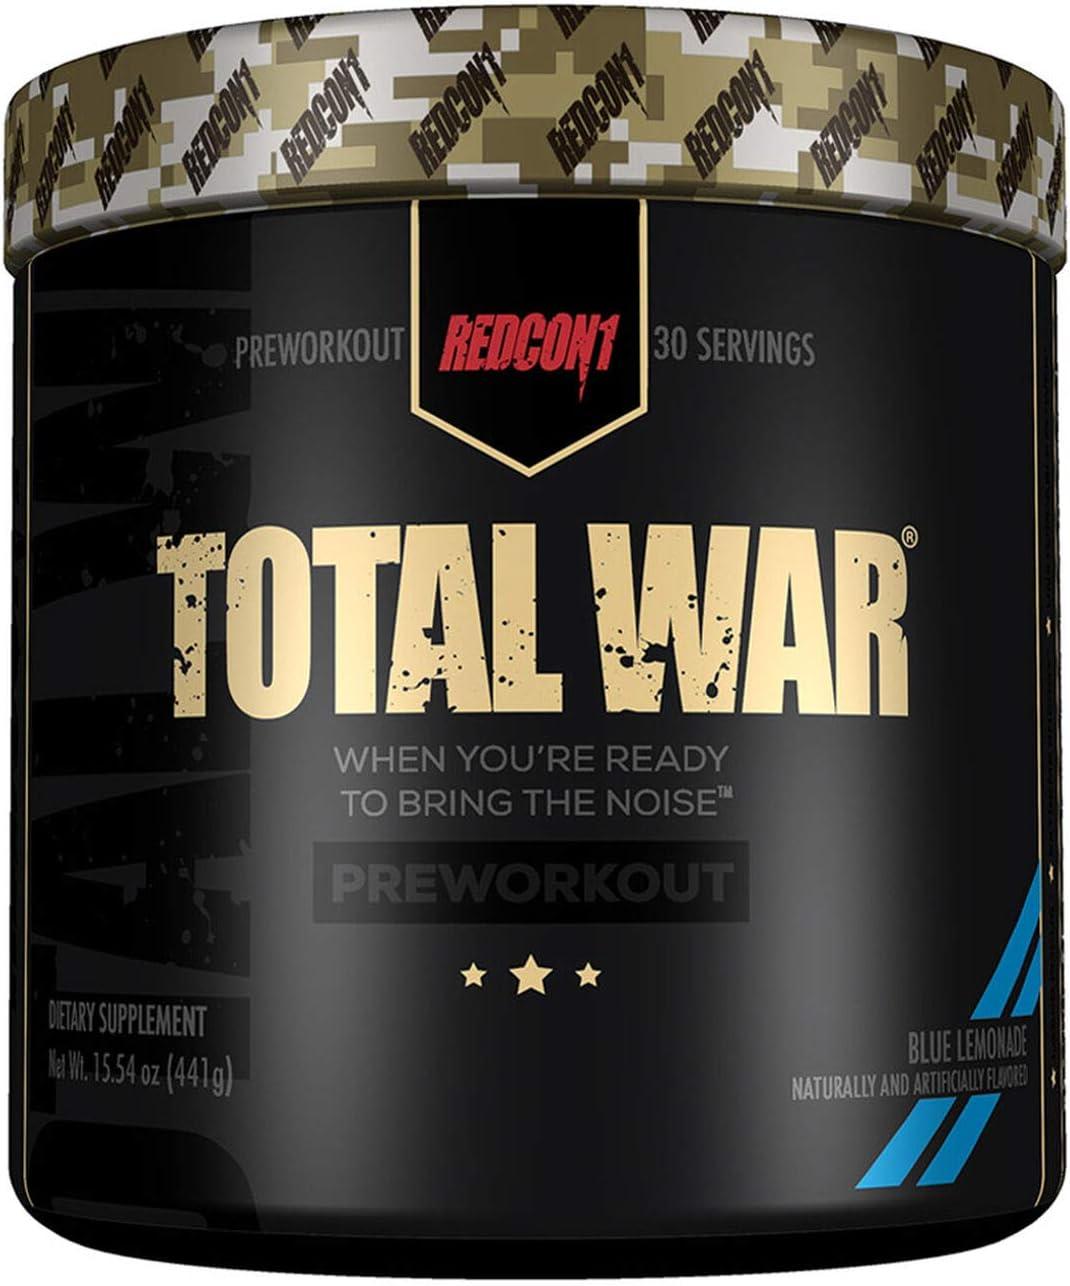 Redcon1 Total War - Pre Workout, 30 Servings, Boost Energy, Increase Endurance and Focus, Beta-Alanine, Caffeine (Blue Lemonade)